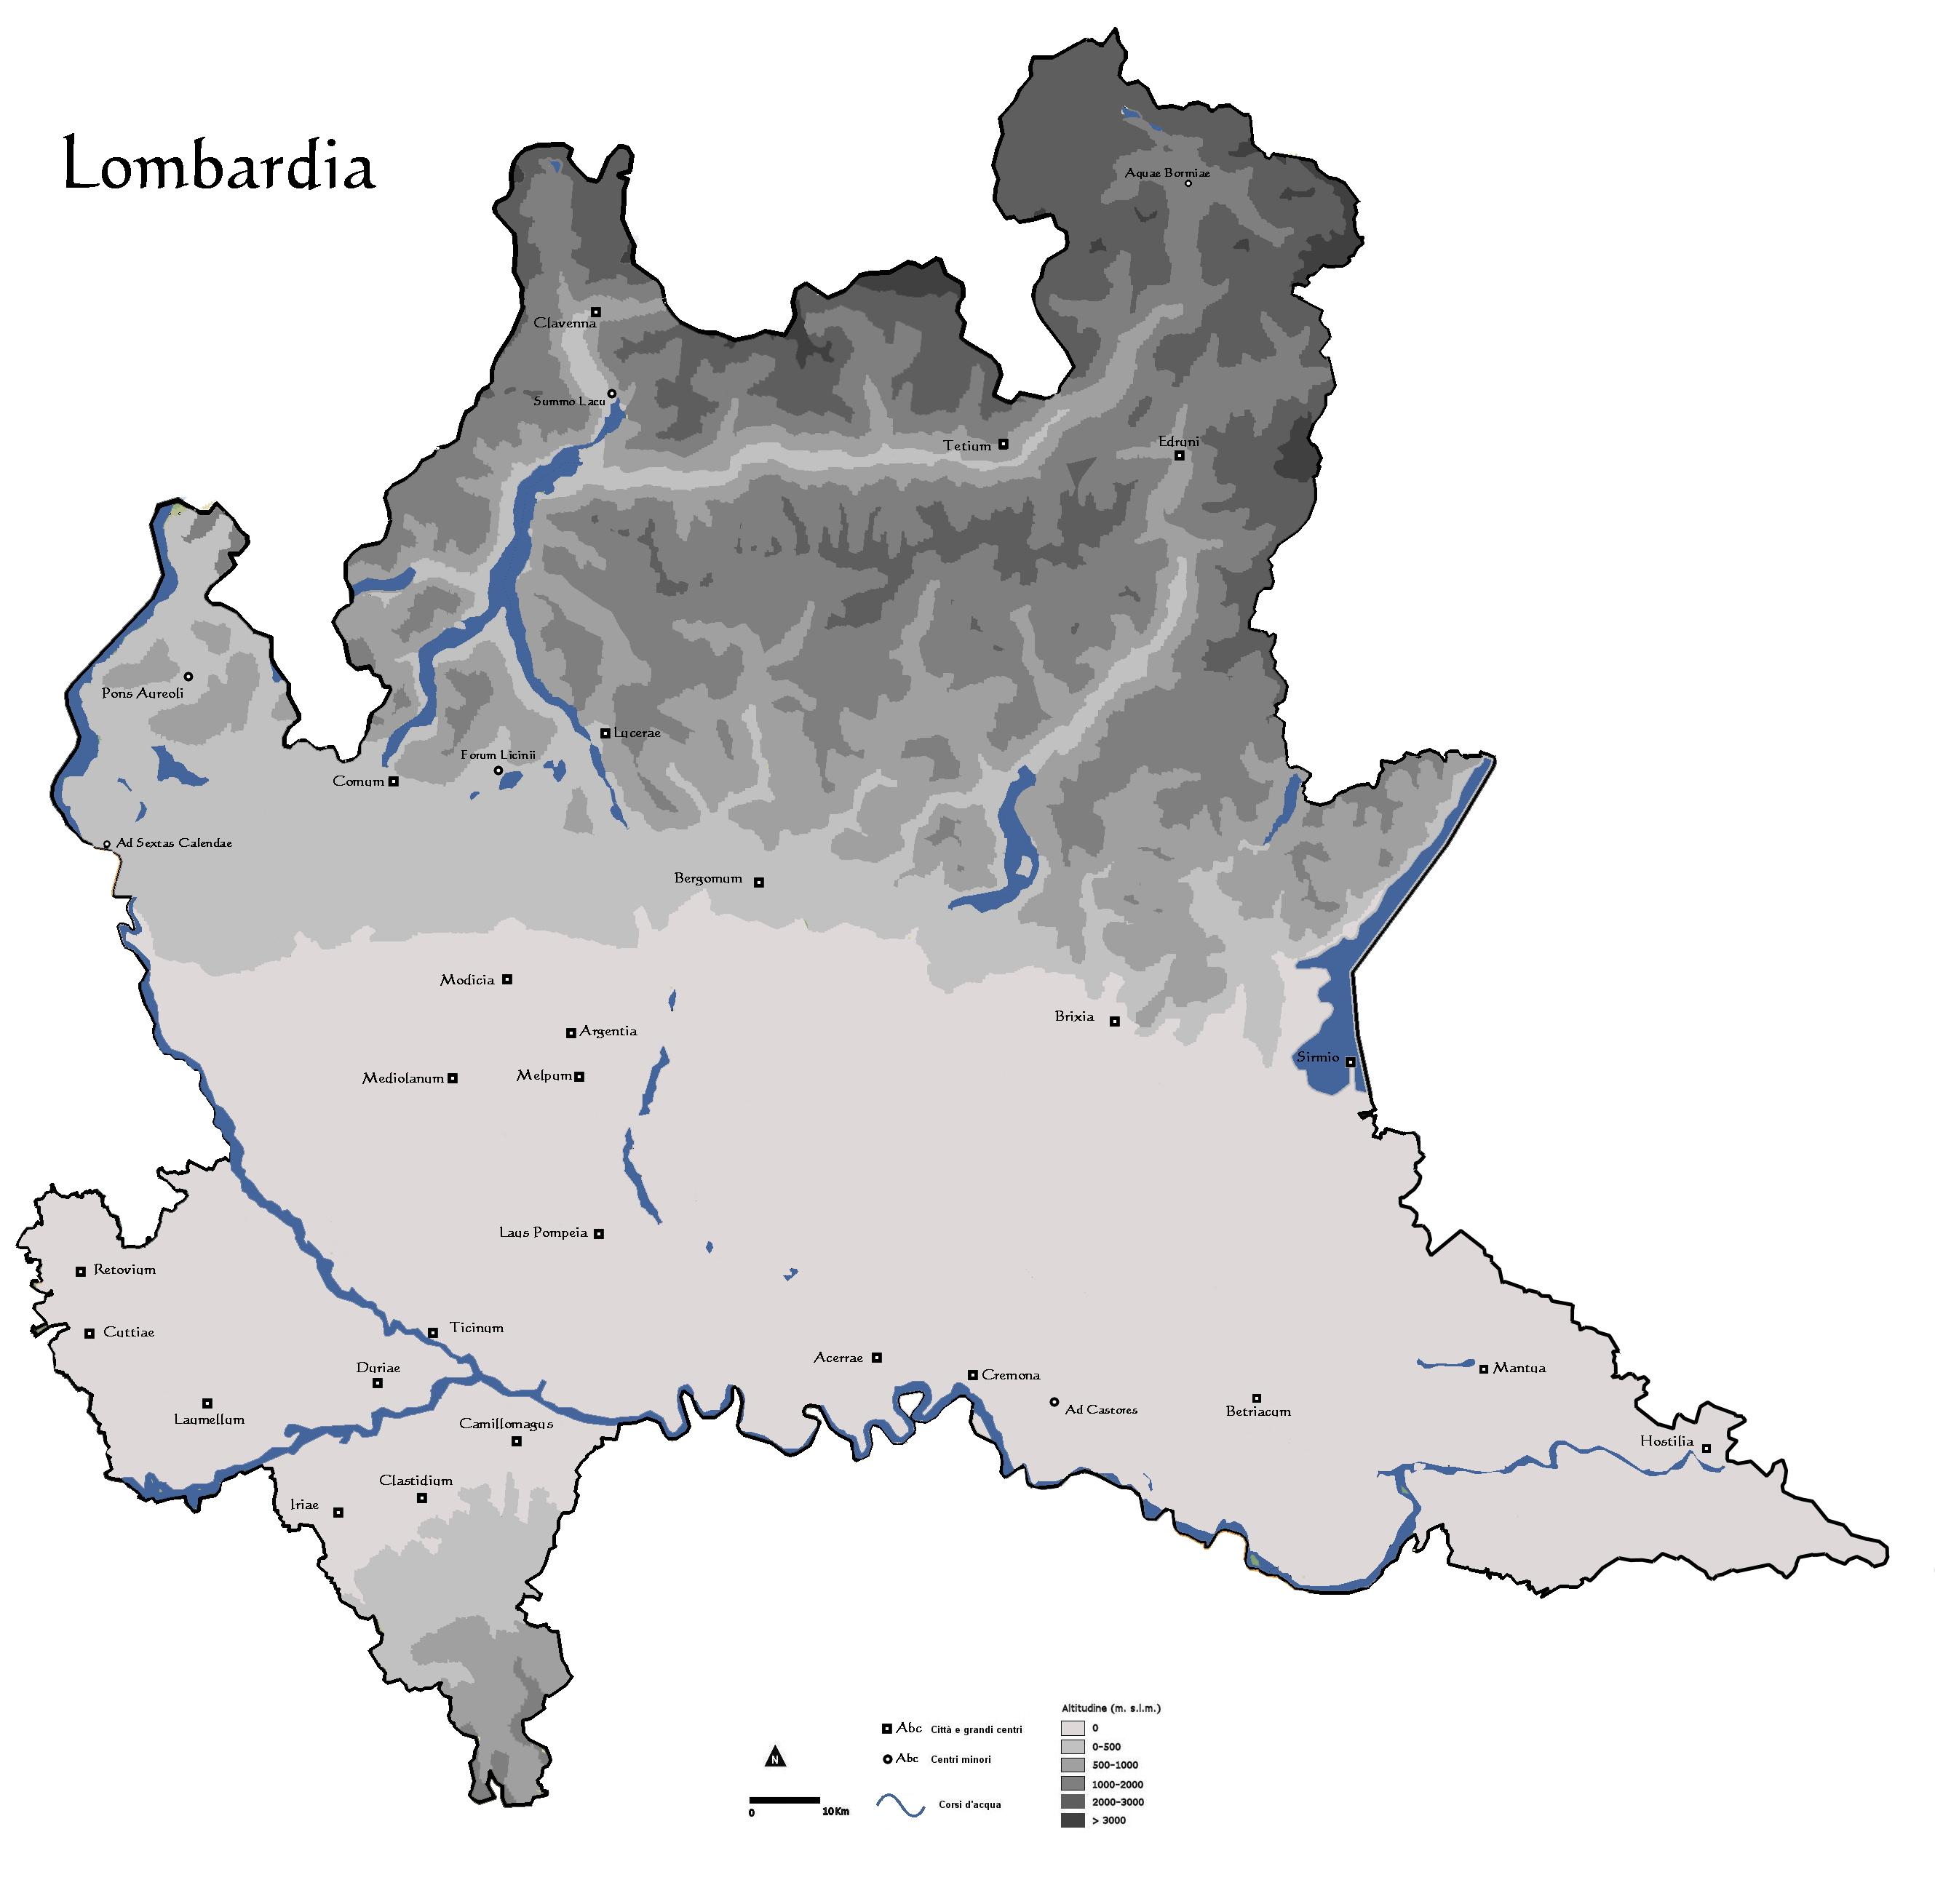 Cartina Economica Lombardia.Instoria Italia Antiqua Iv Lombardia Parte Iv